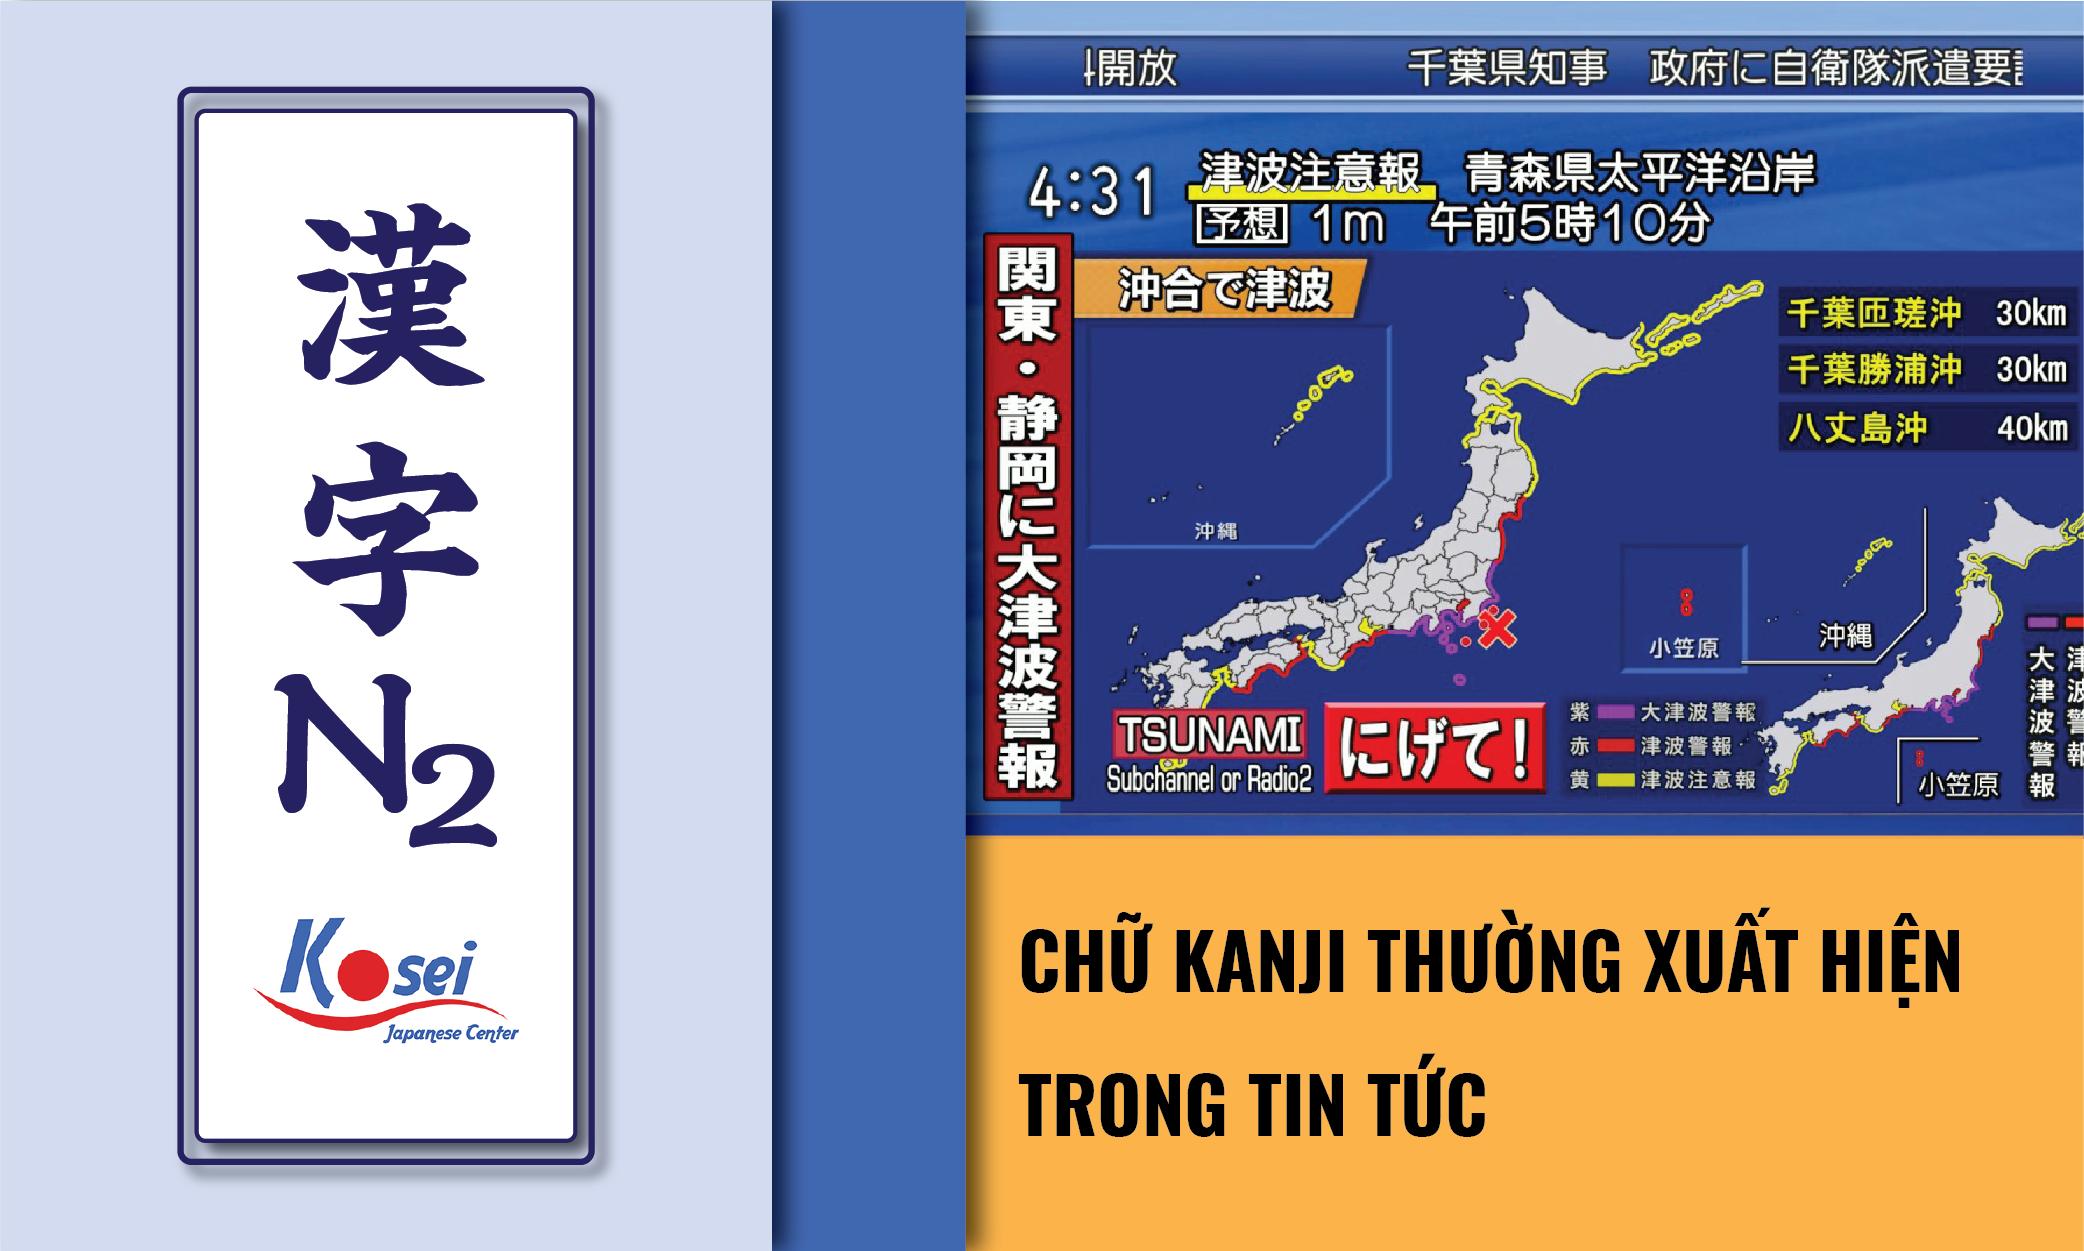 https://kosei.vn/tong-hop-kanji-n2-cac-kanji-ve-tin-tuc-n2260.html